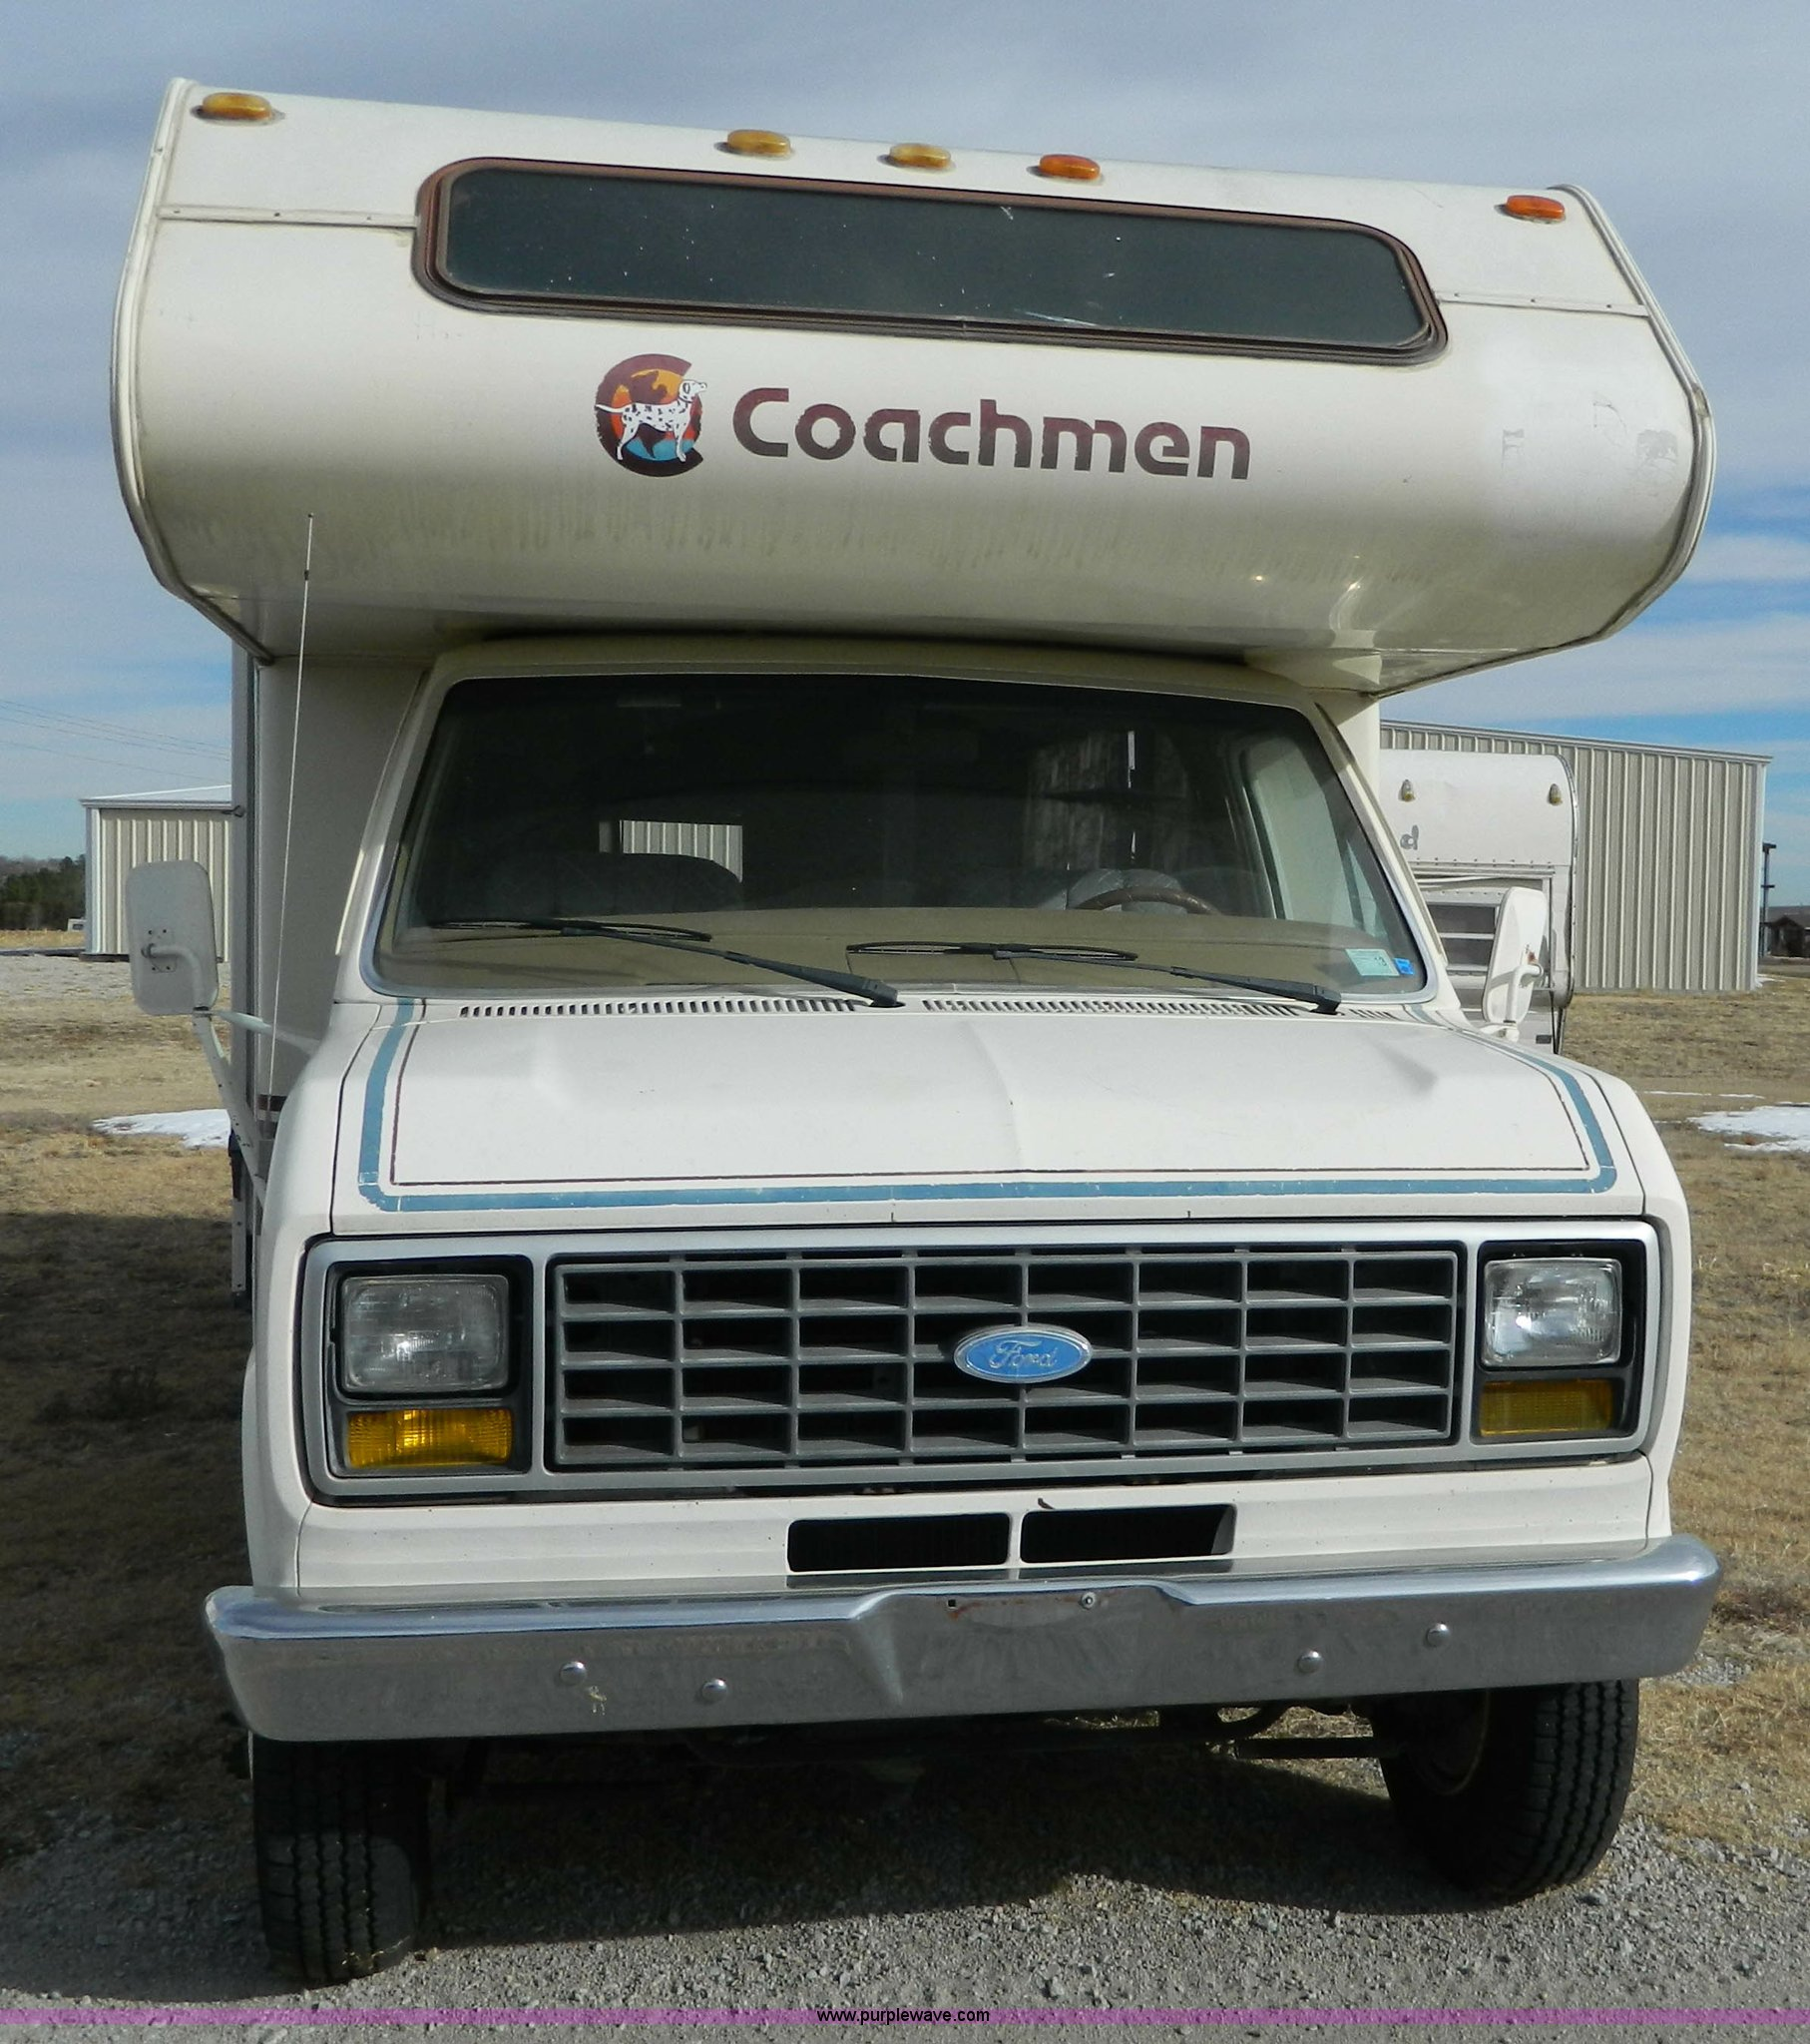 1985 Ford Econoline E350 Coachman 26' recreational vehicle |